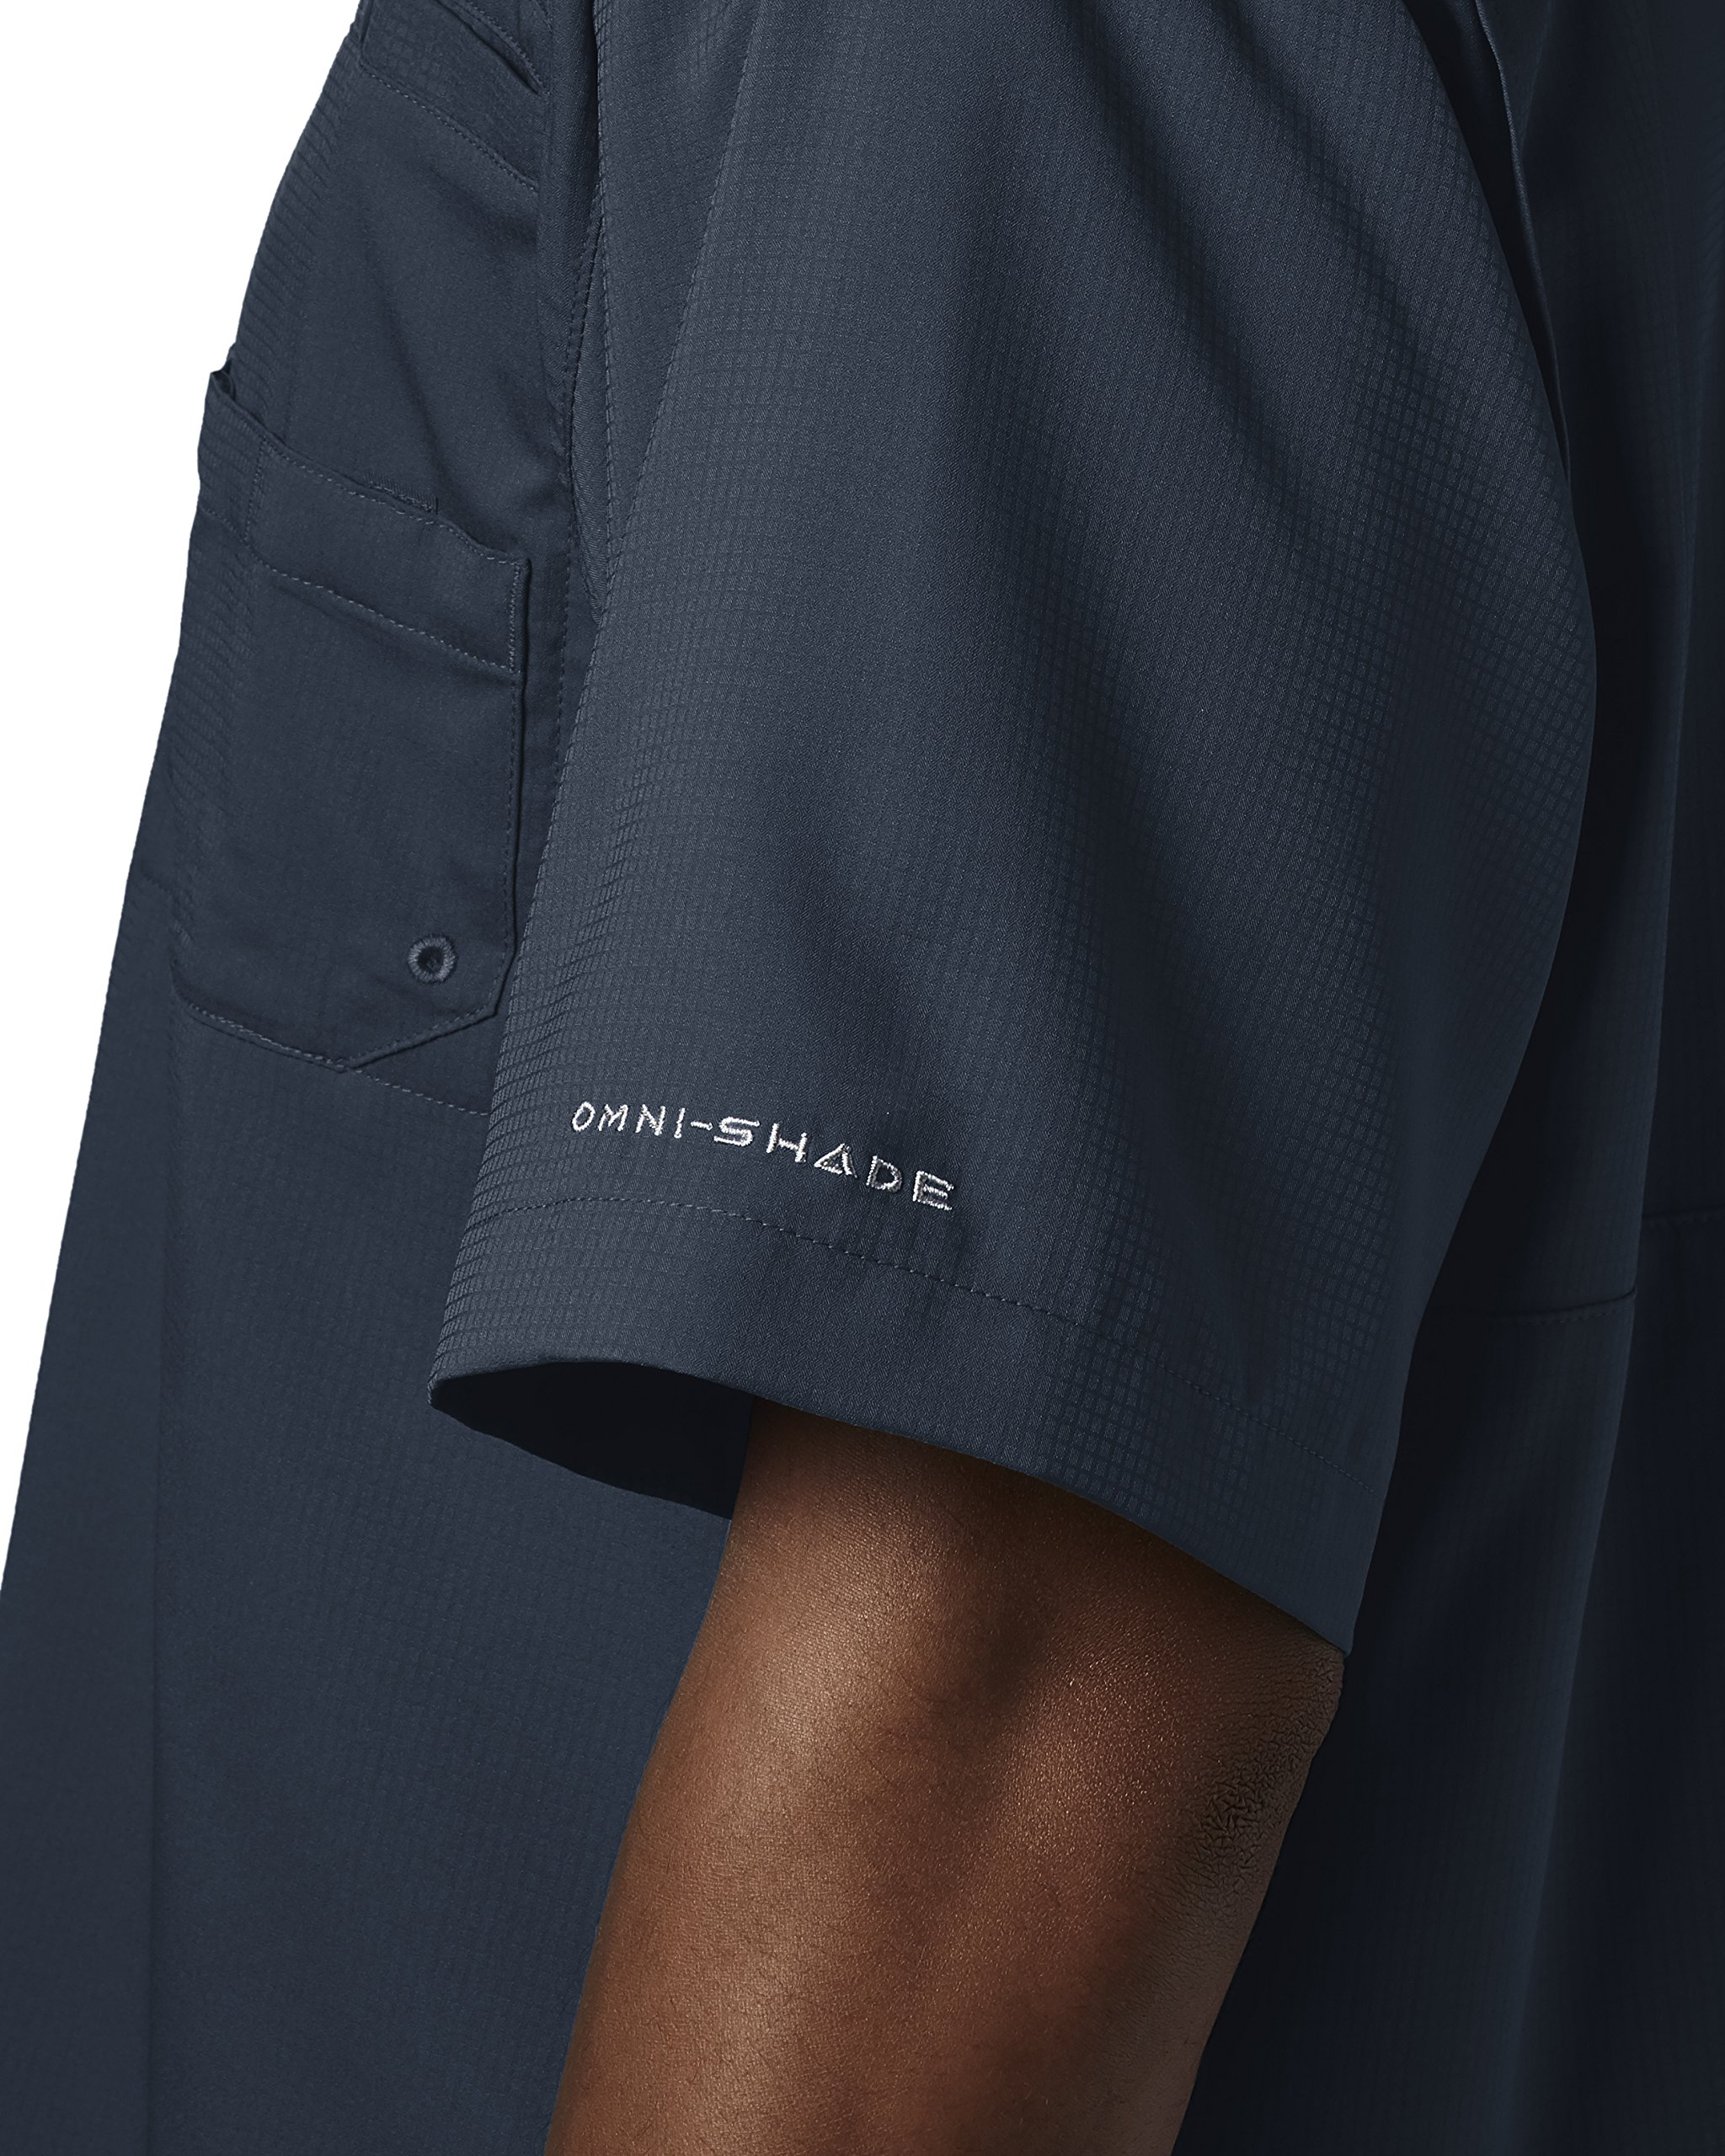 Columbia Men's Tamiami II Short Sleeve Fishing Shirt, Collegiate Navy, X-Small by Columbia (Image #4)